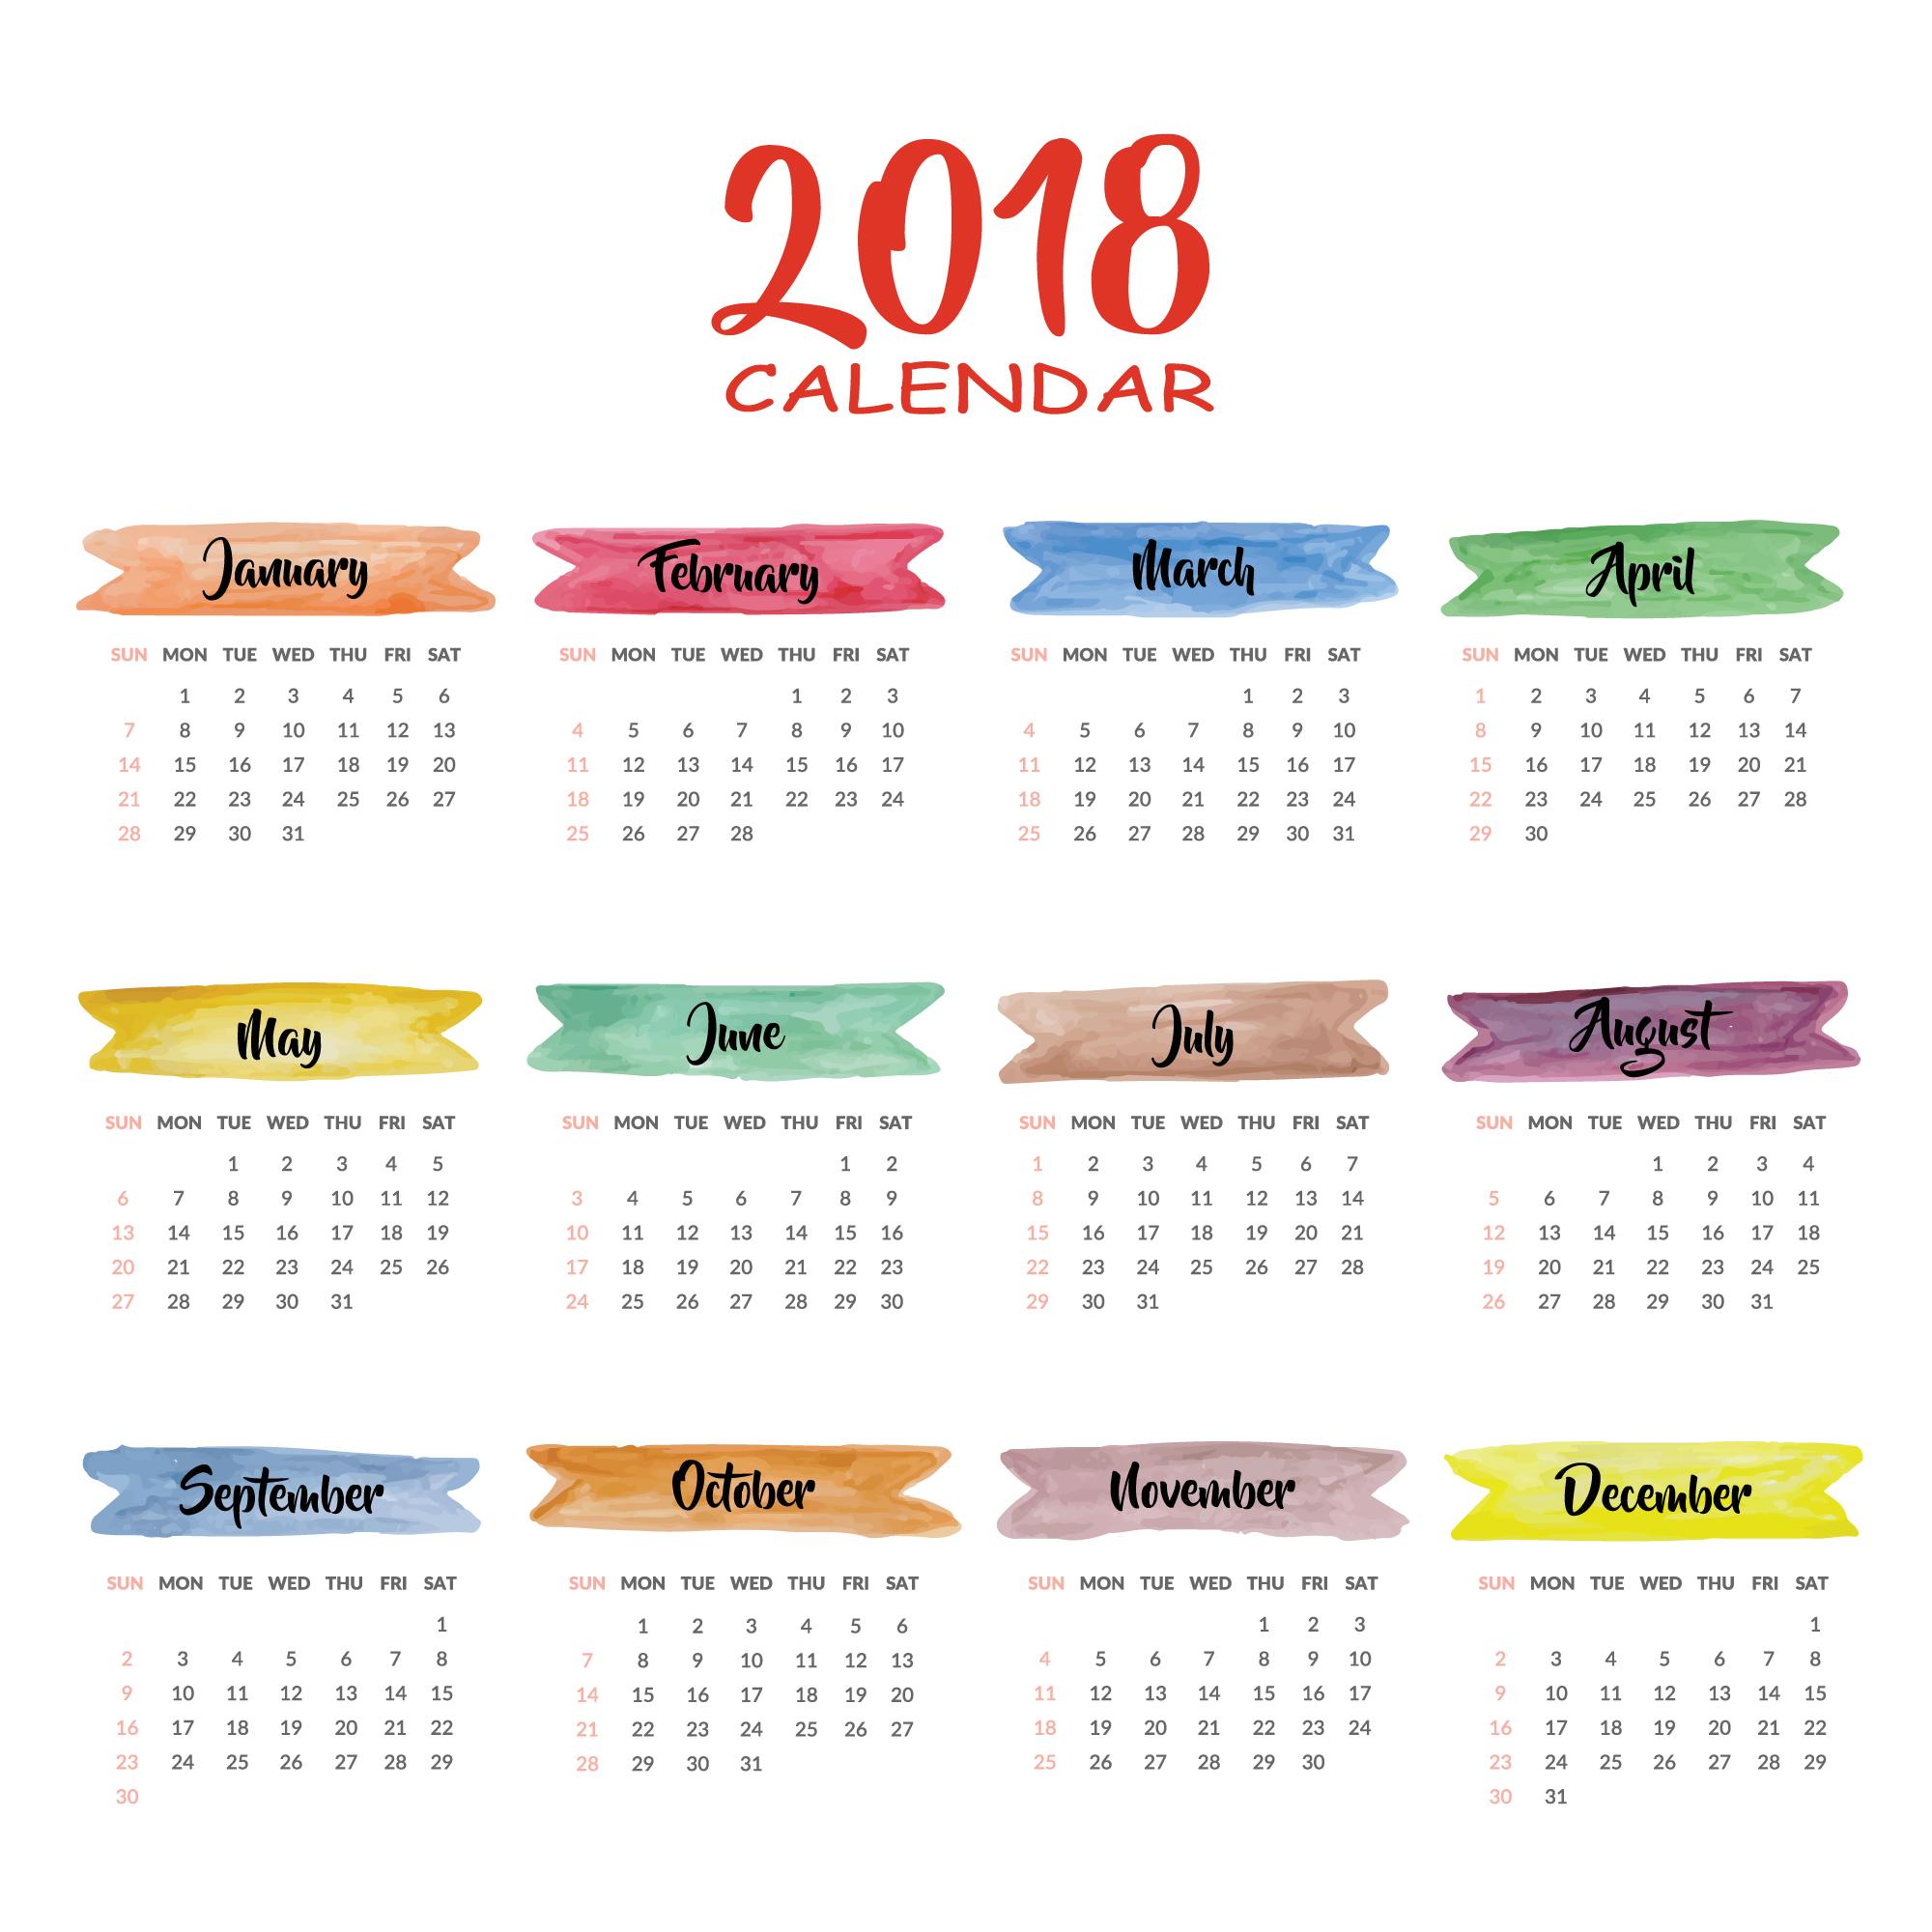 2018 Holiday Calendar Wallpaper View HD Image Of 2018